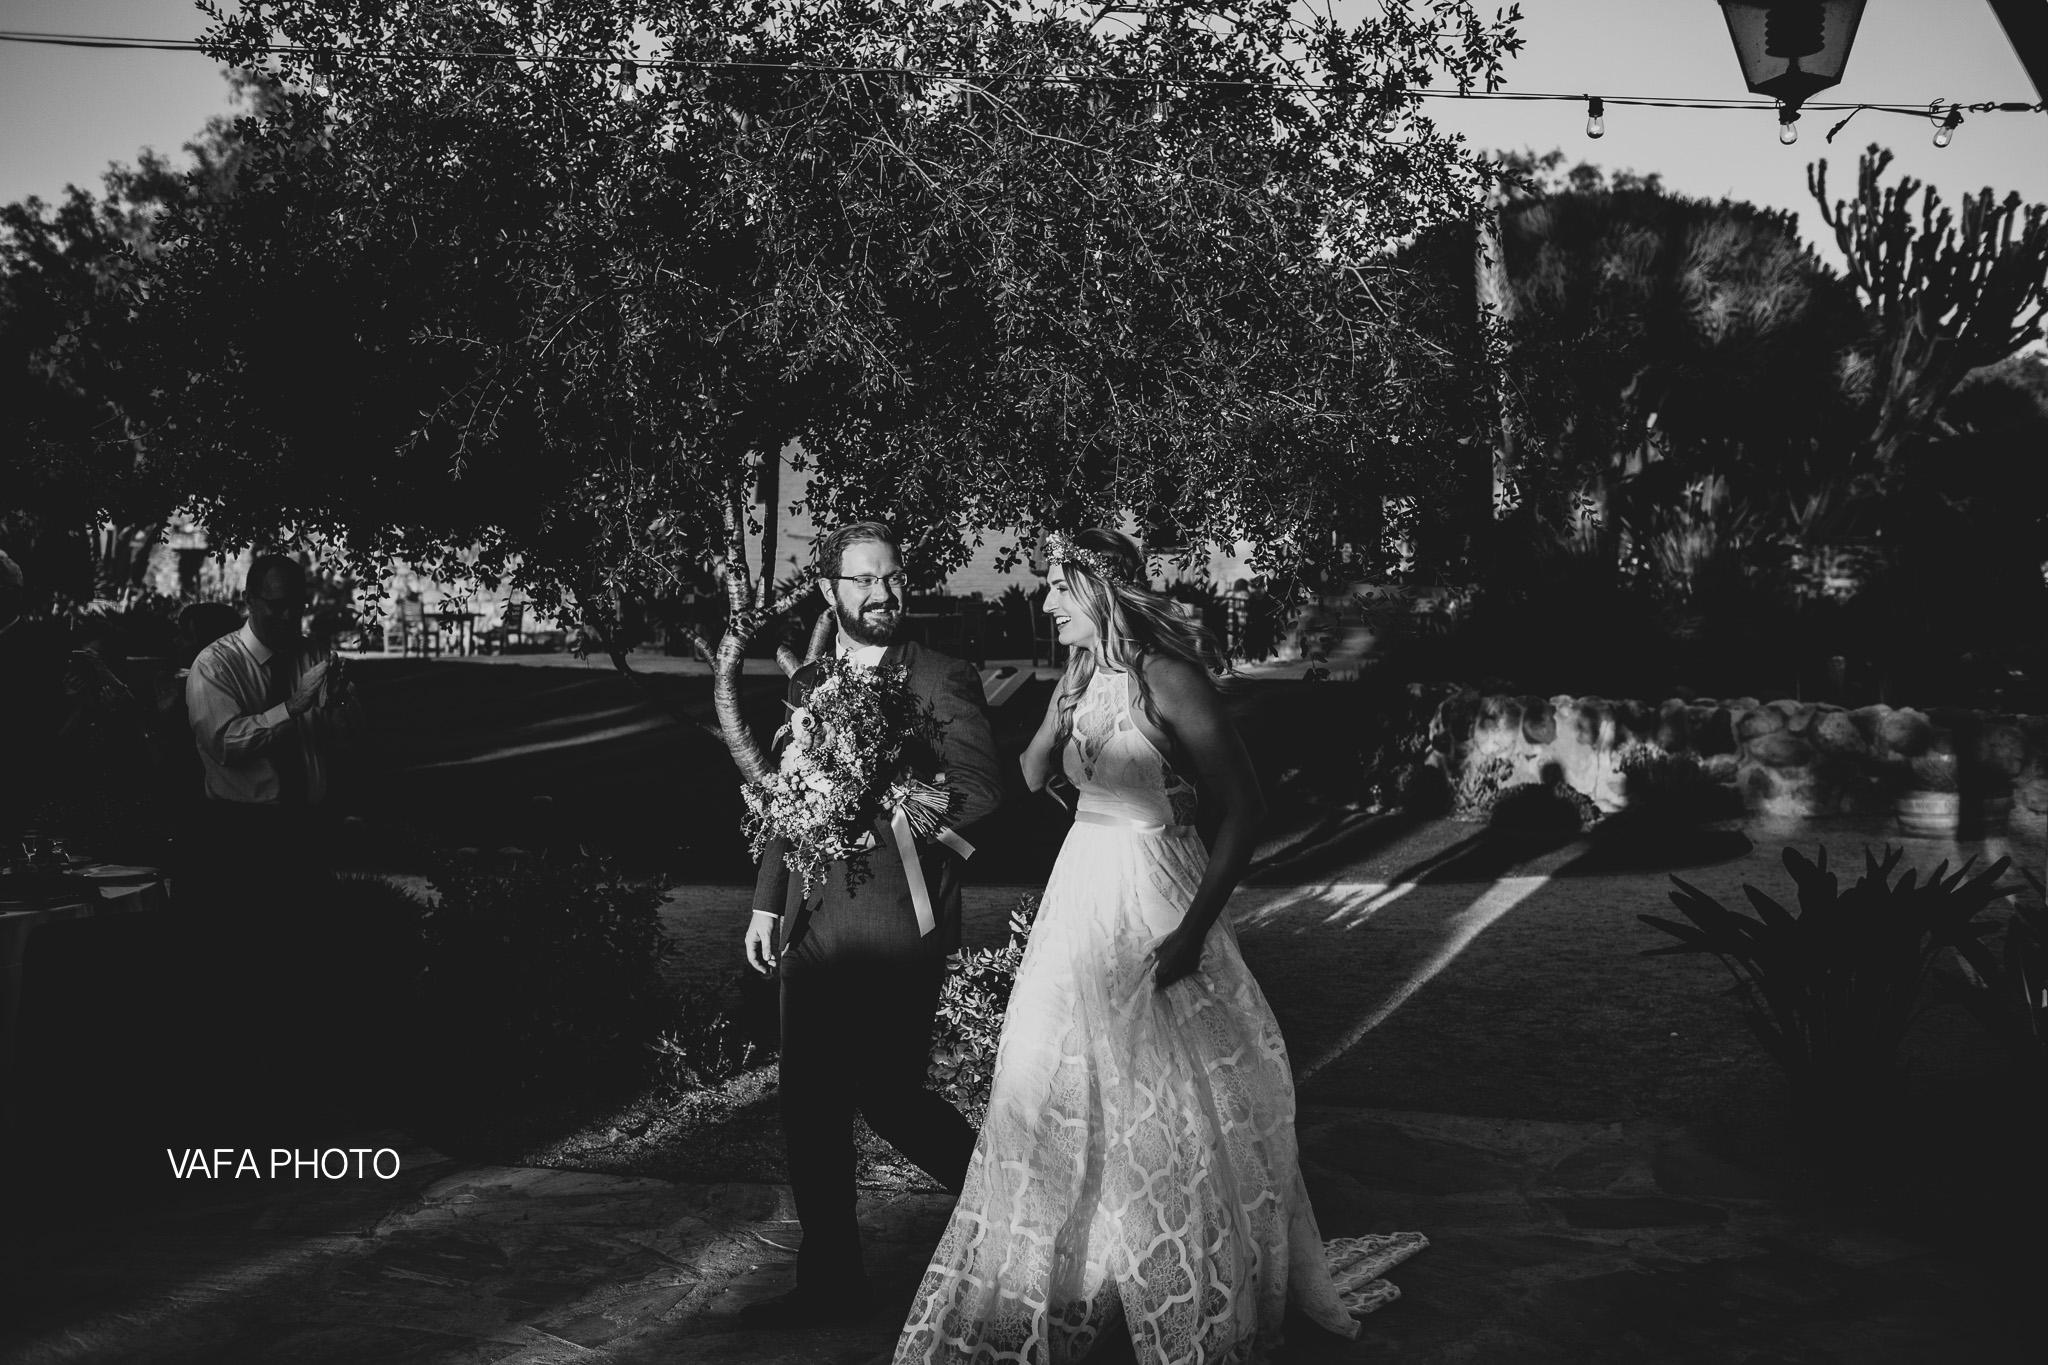 Leo-Carrillo-Ranch-Wedding-Lauren-Mike-Vafa-Photo-895.jpg